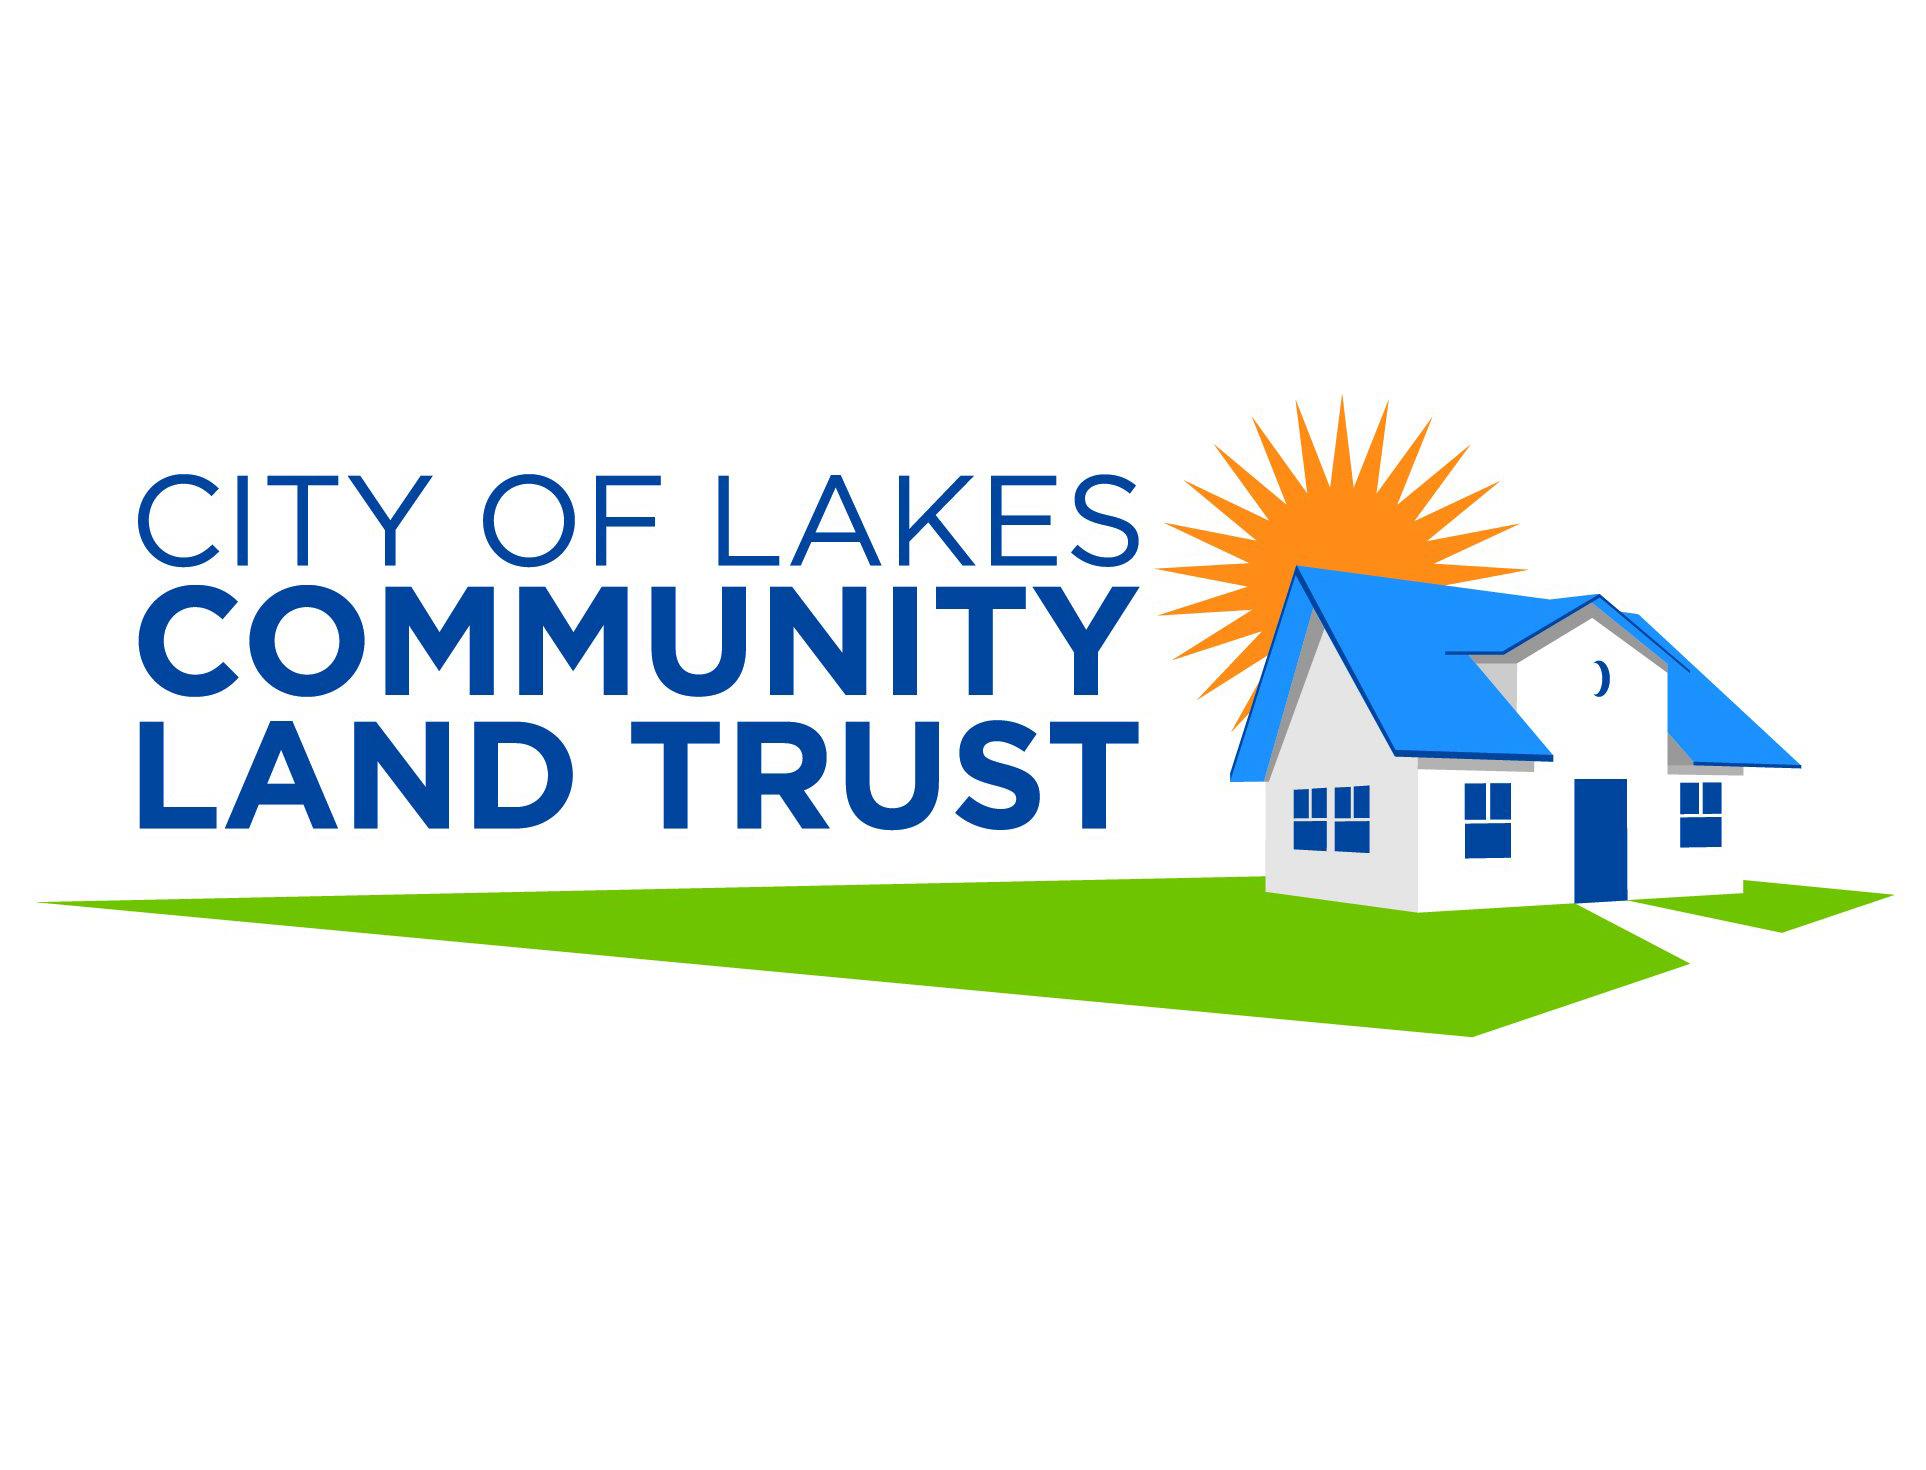 City Of Lakes Community Land Trust